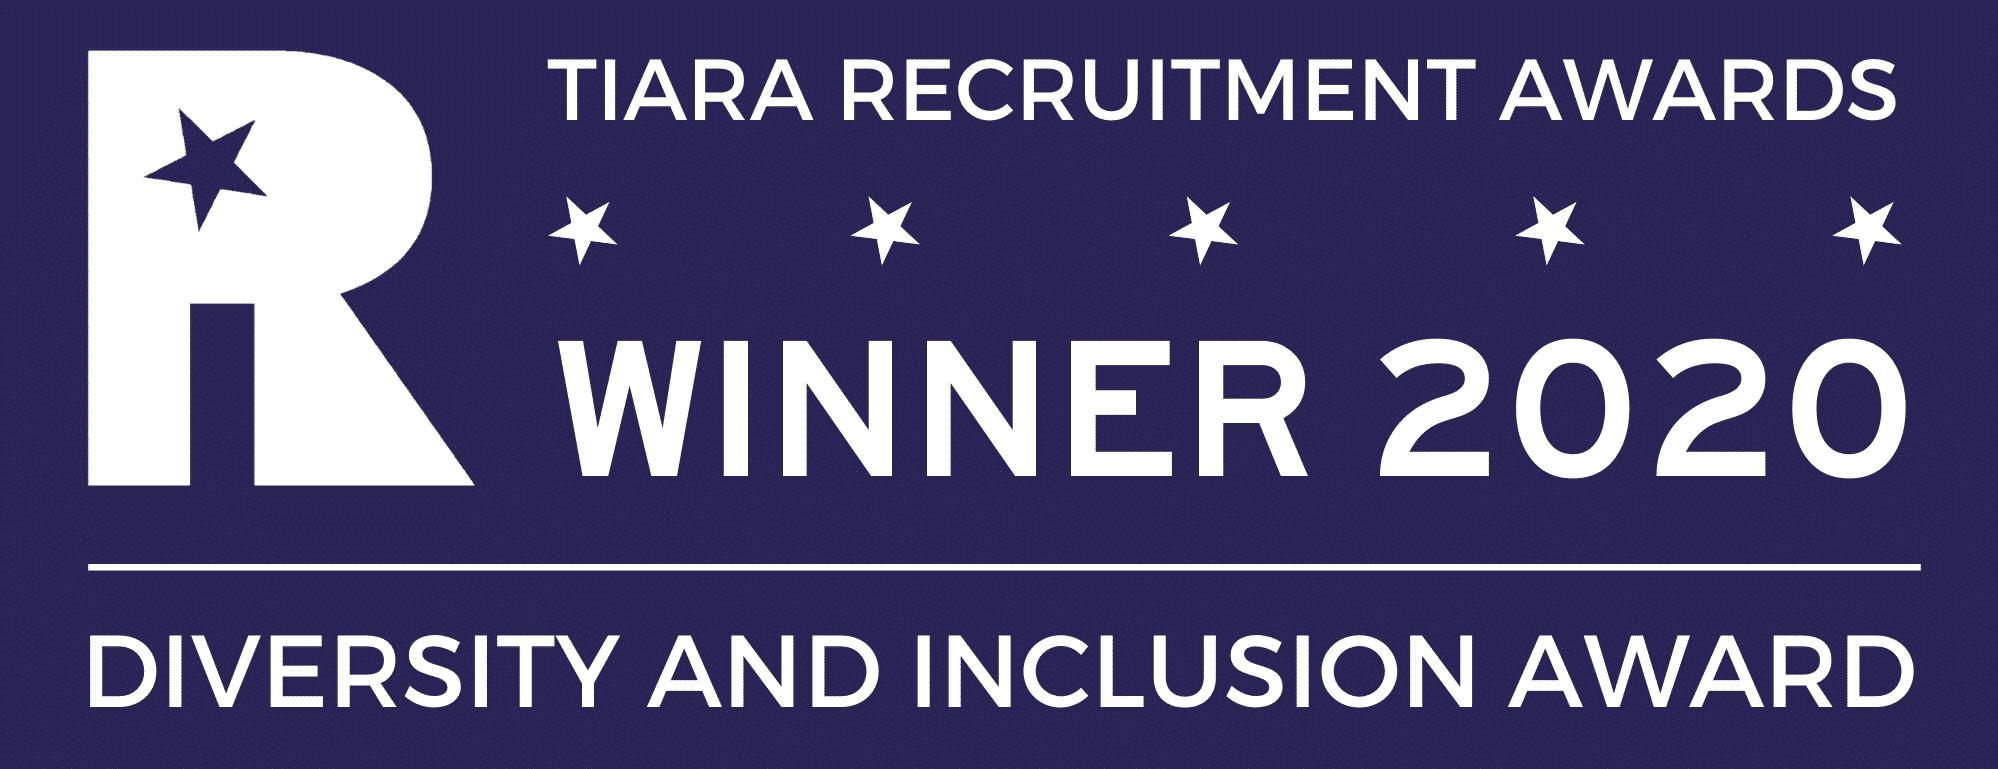 TIARA 2020 Winner